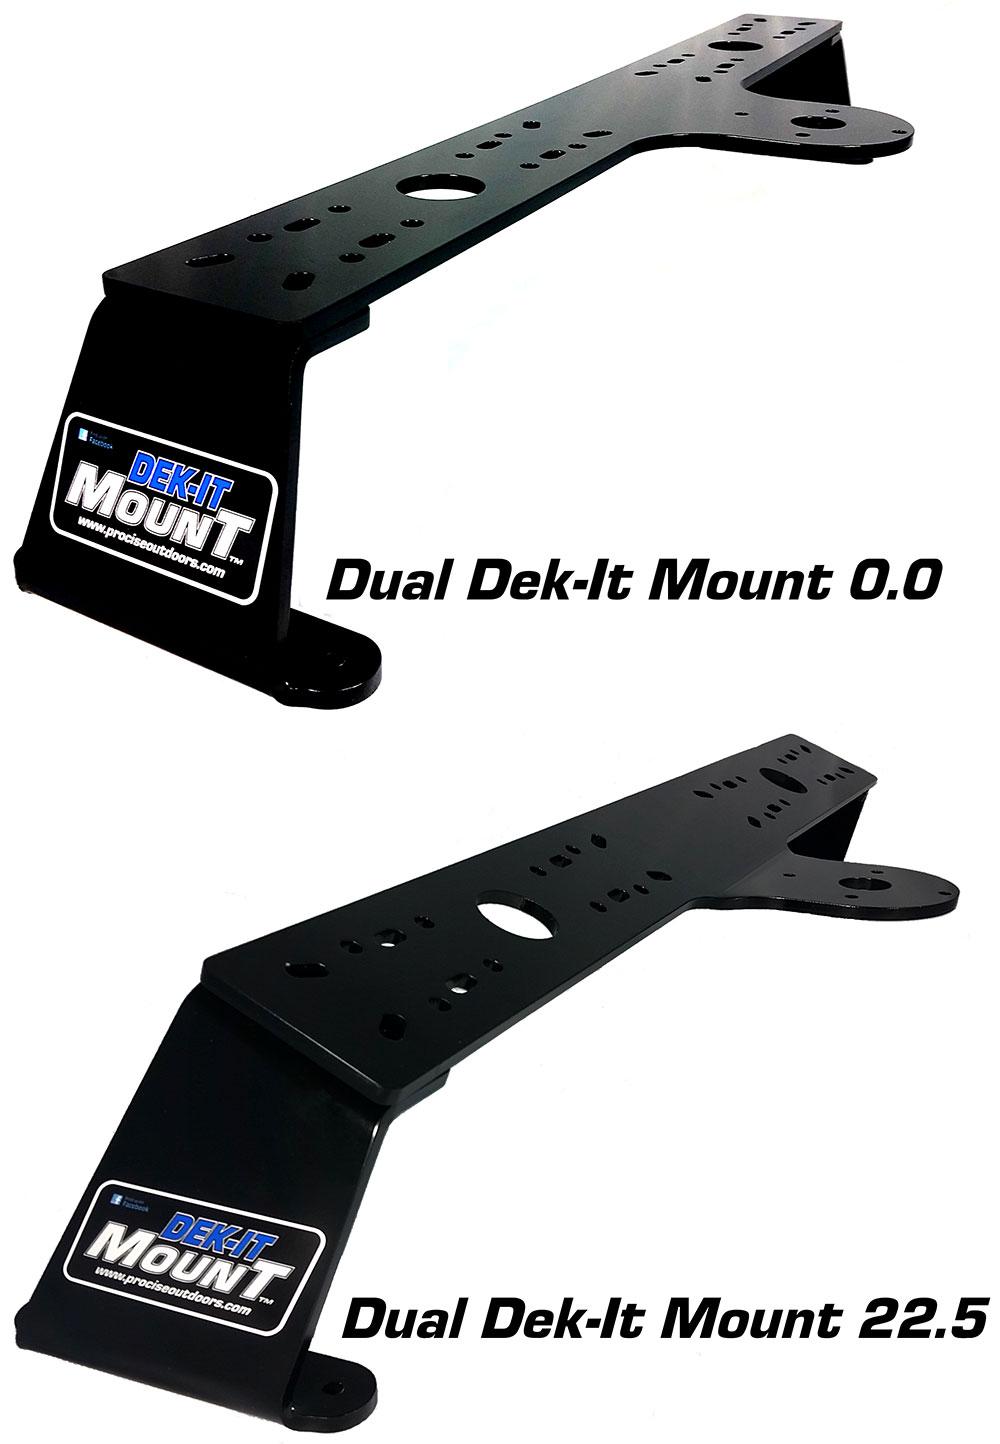 Dual Unit Dek-It Mounts